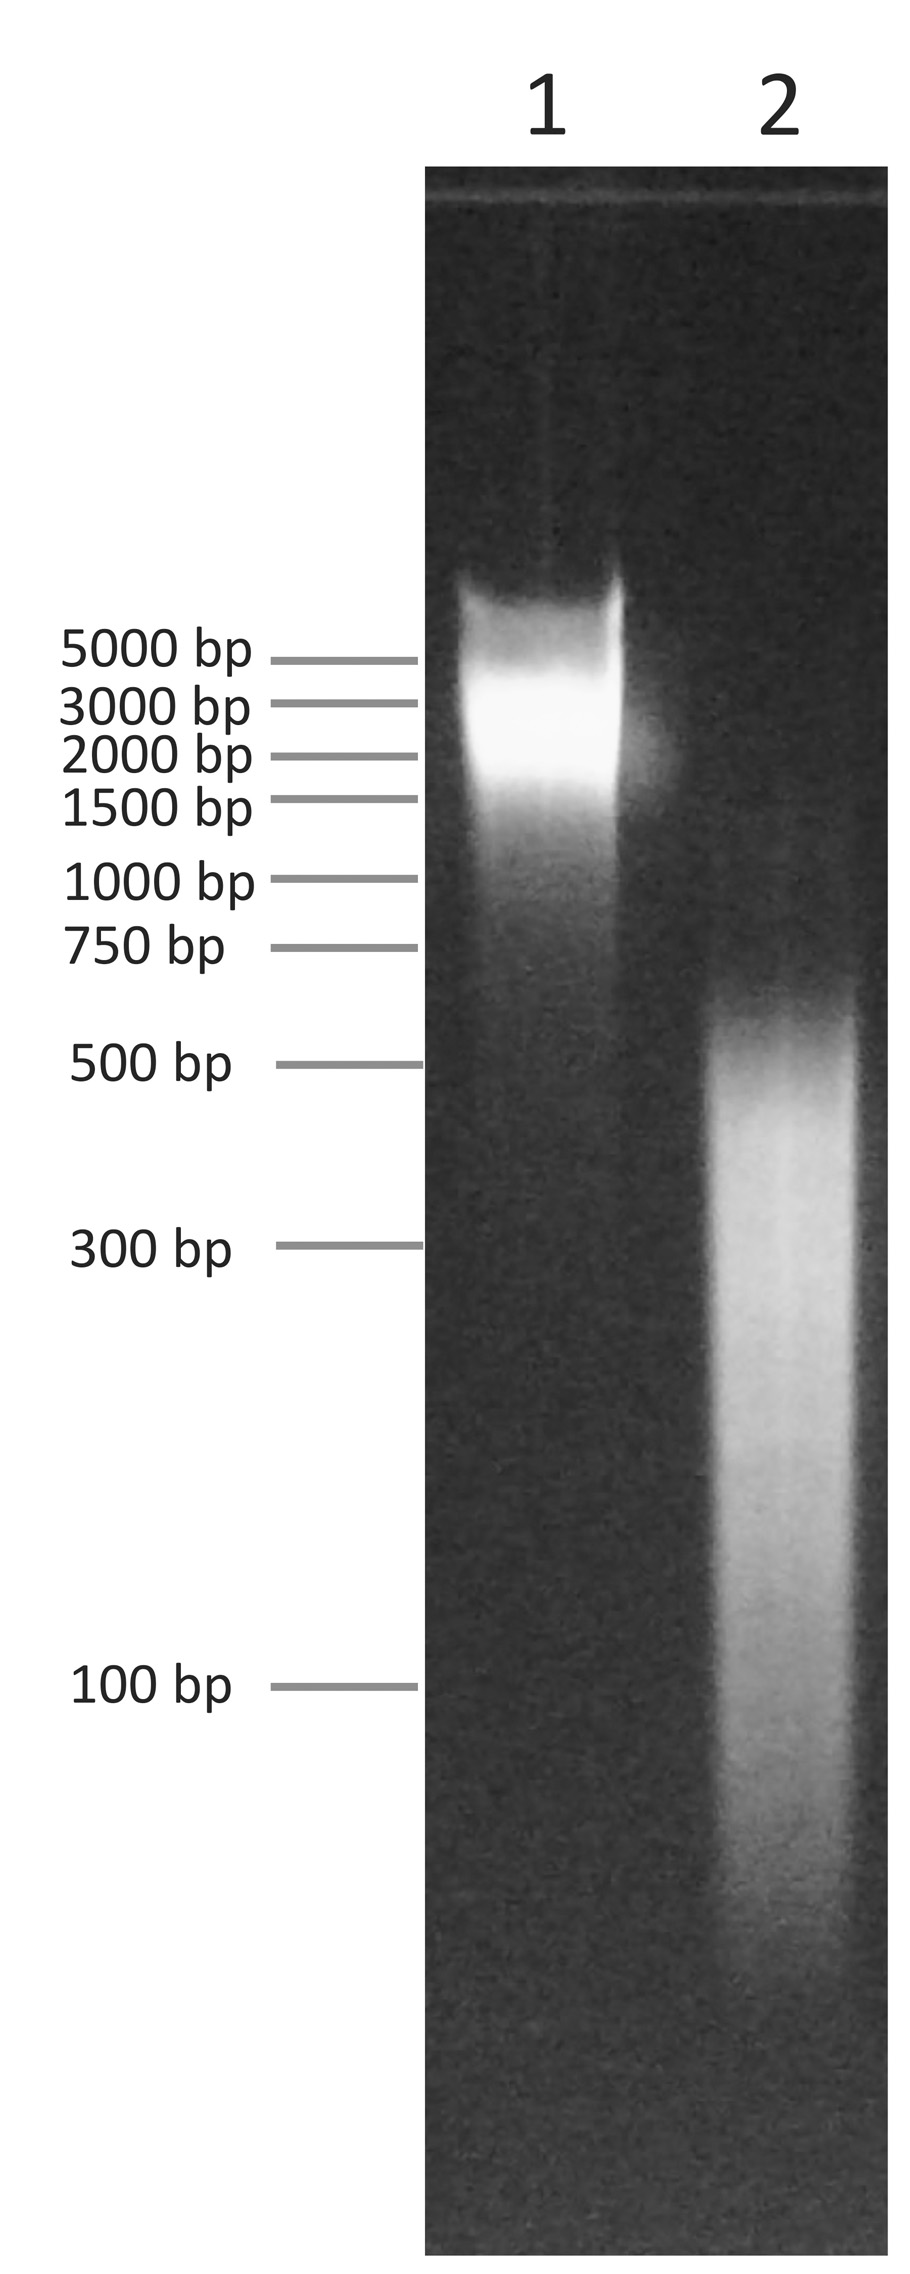 18-1401 Gel Data